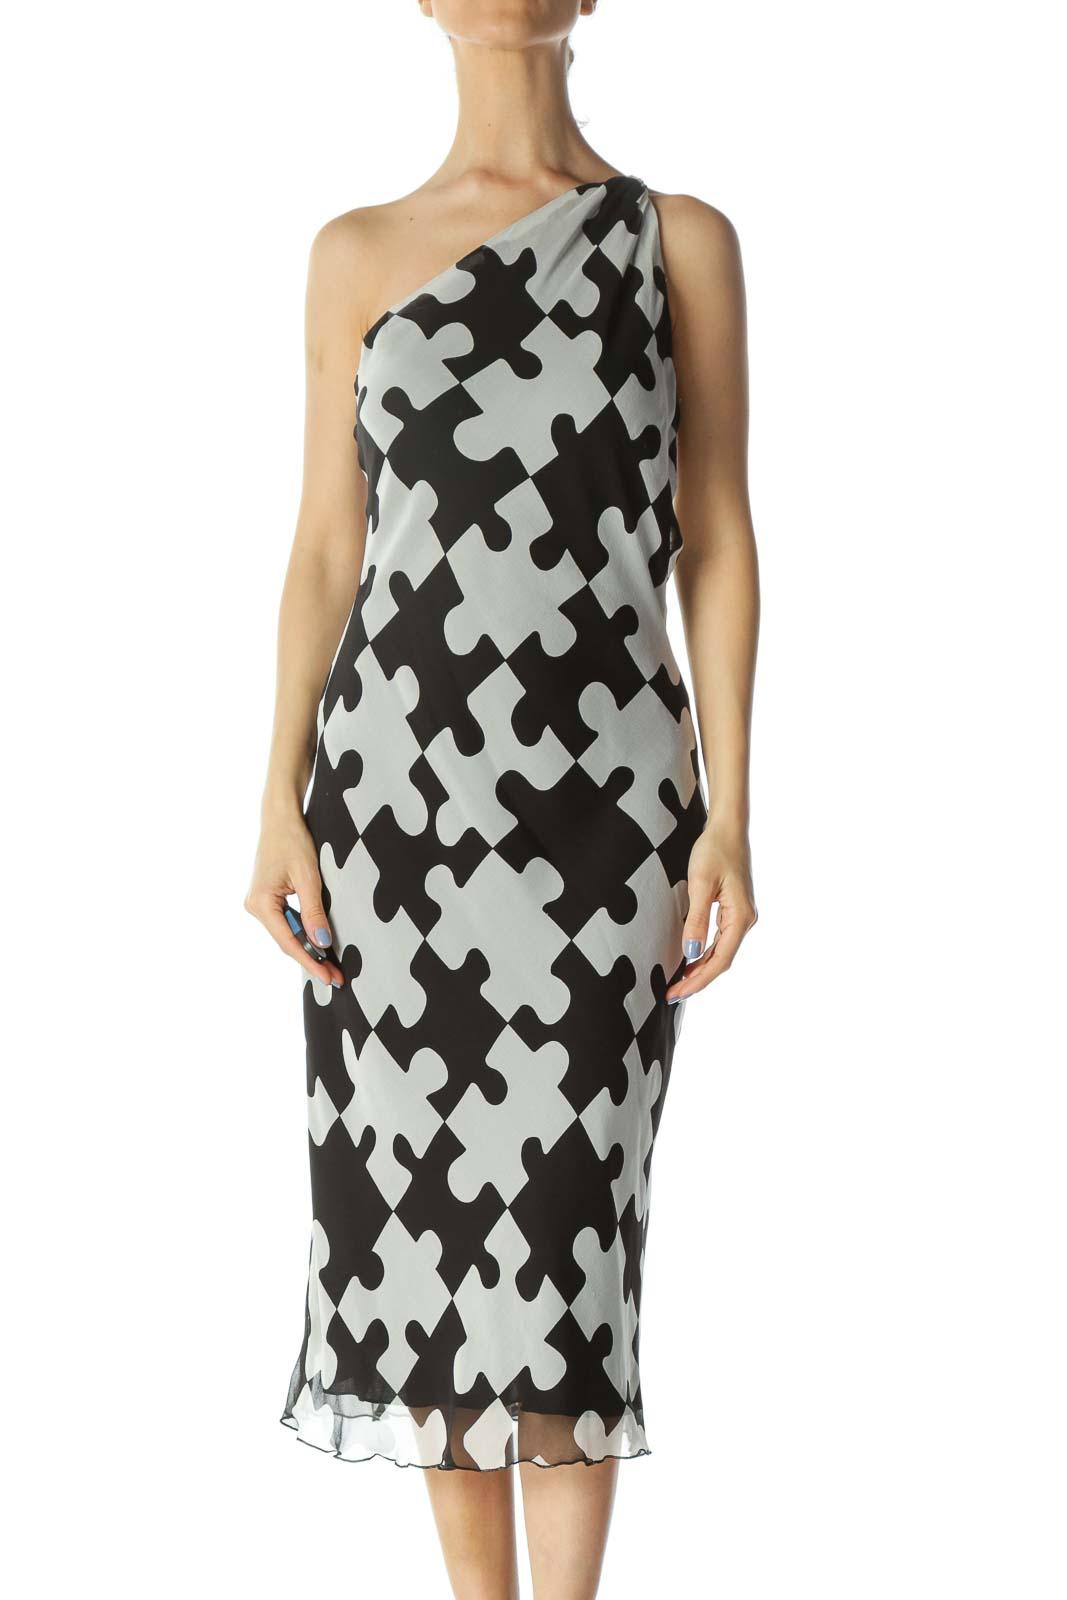 Black/White 100% Silk Puzzle-Print Knot-Detail Light Dress Front